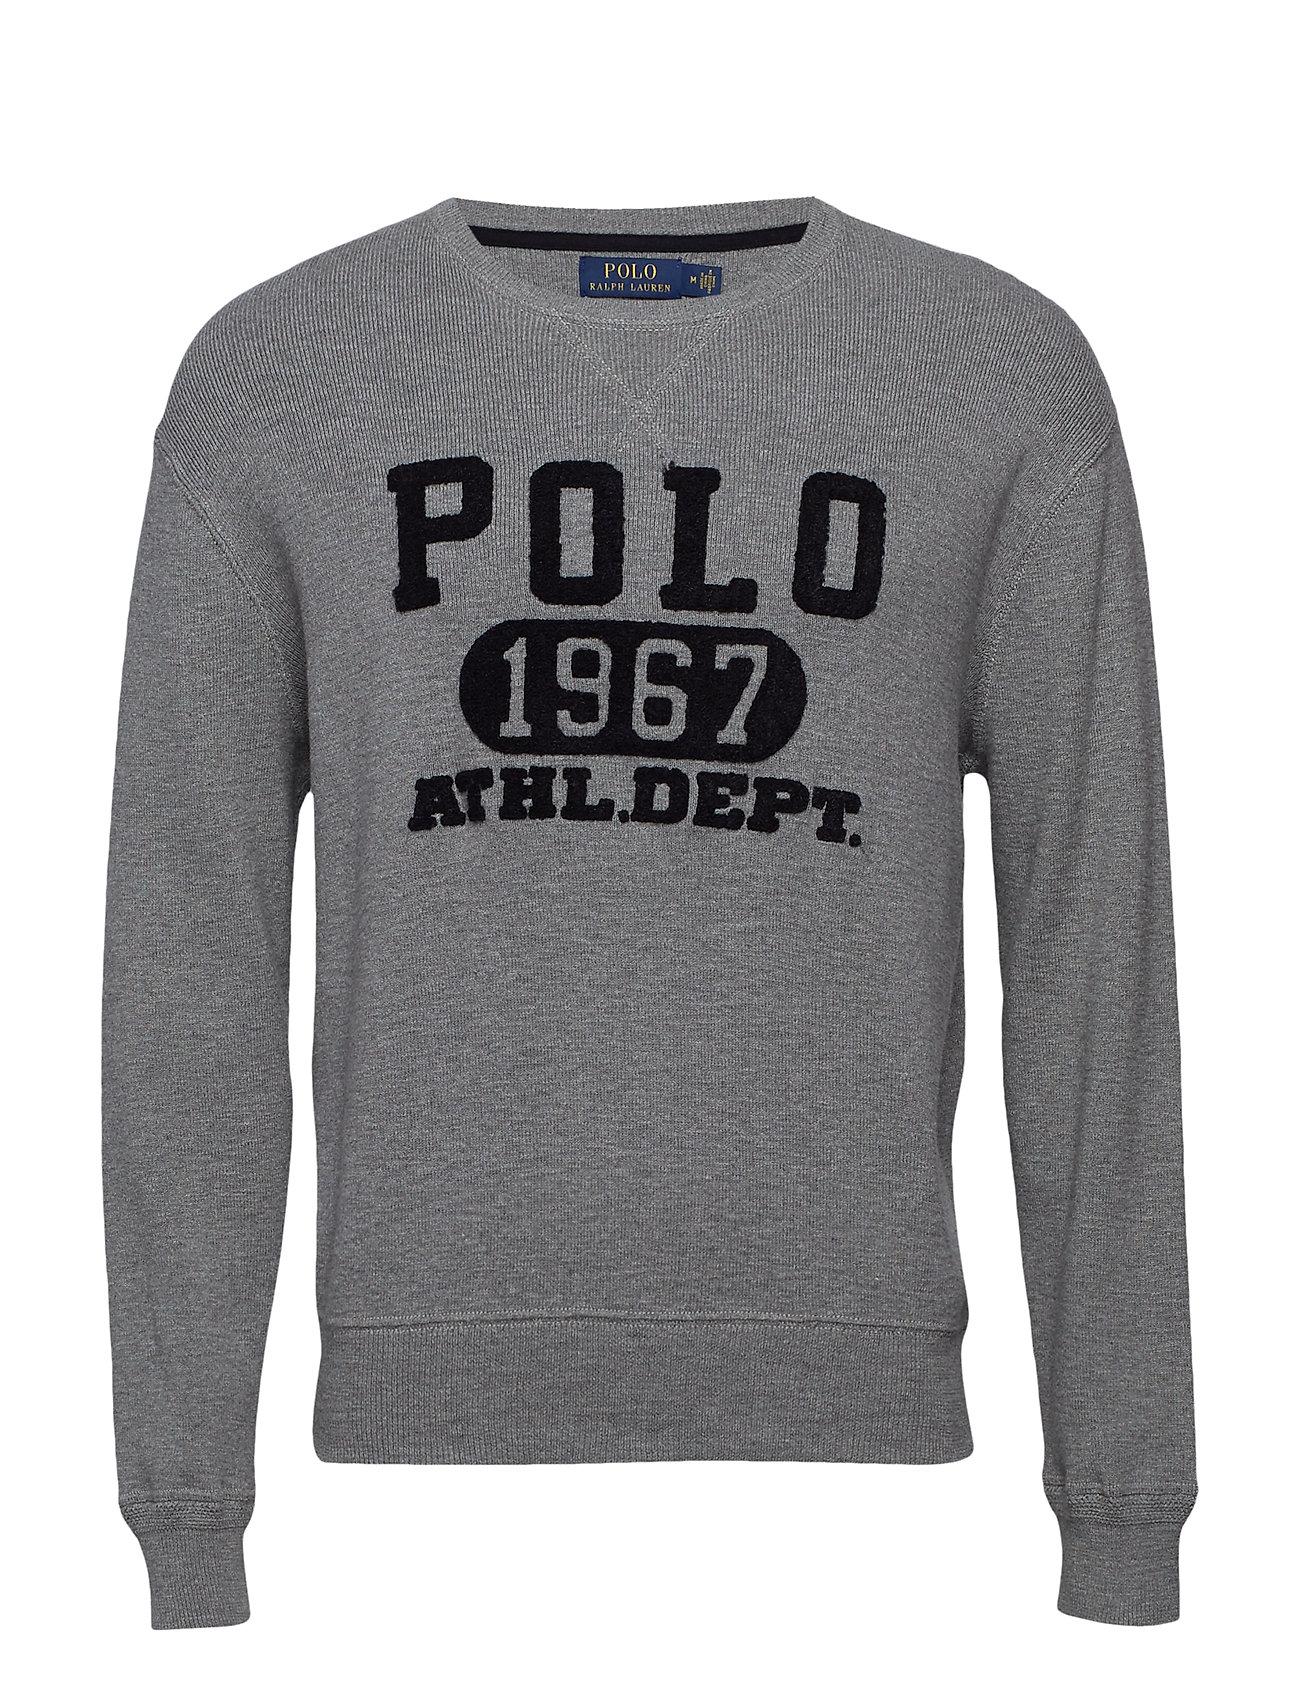 Polo Ralph Lauren Cotton Graphic Sweater